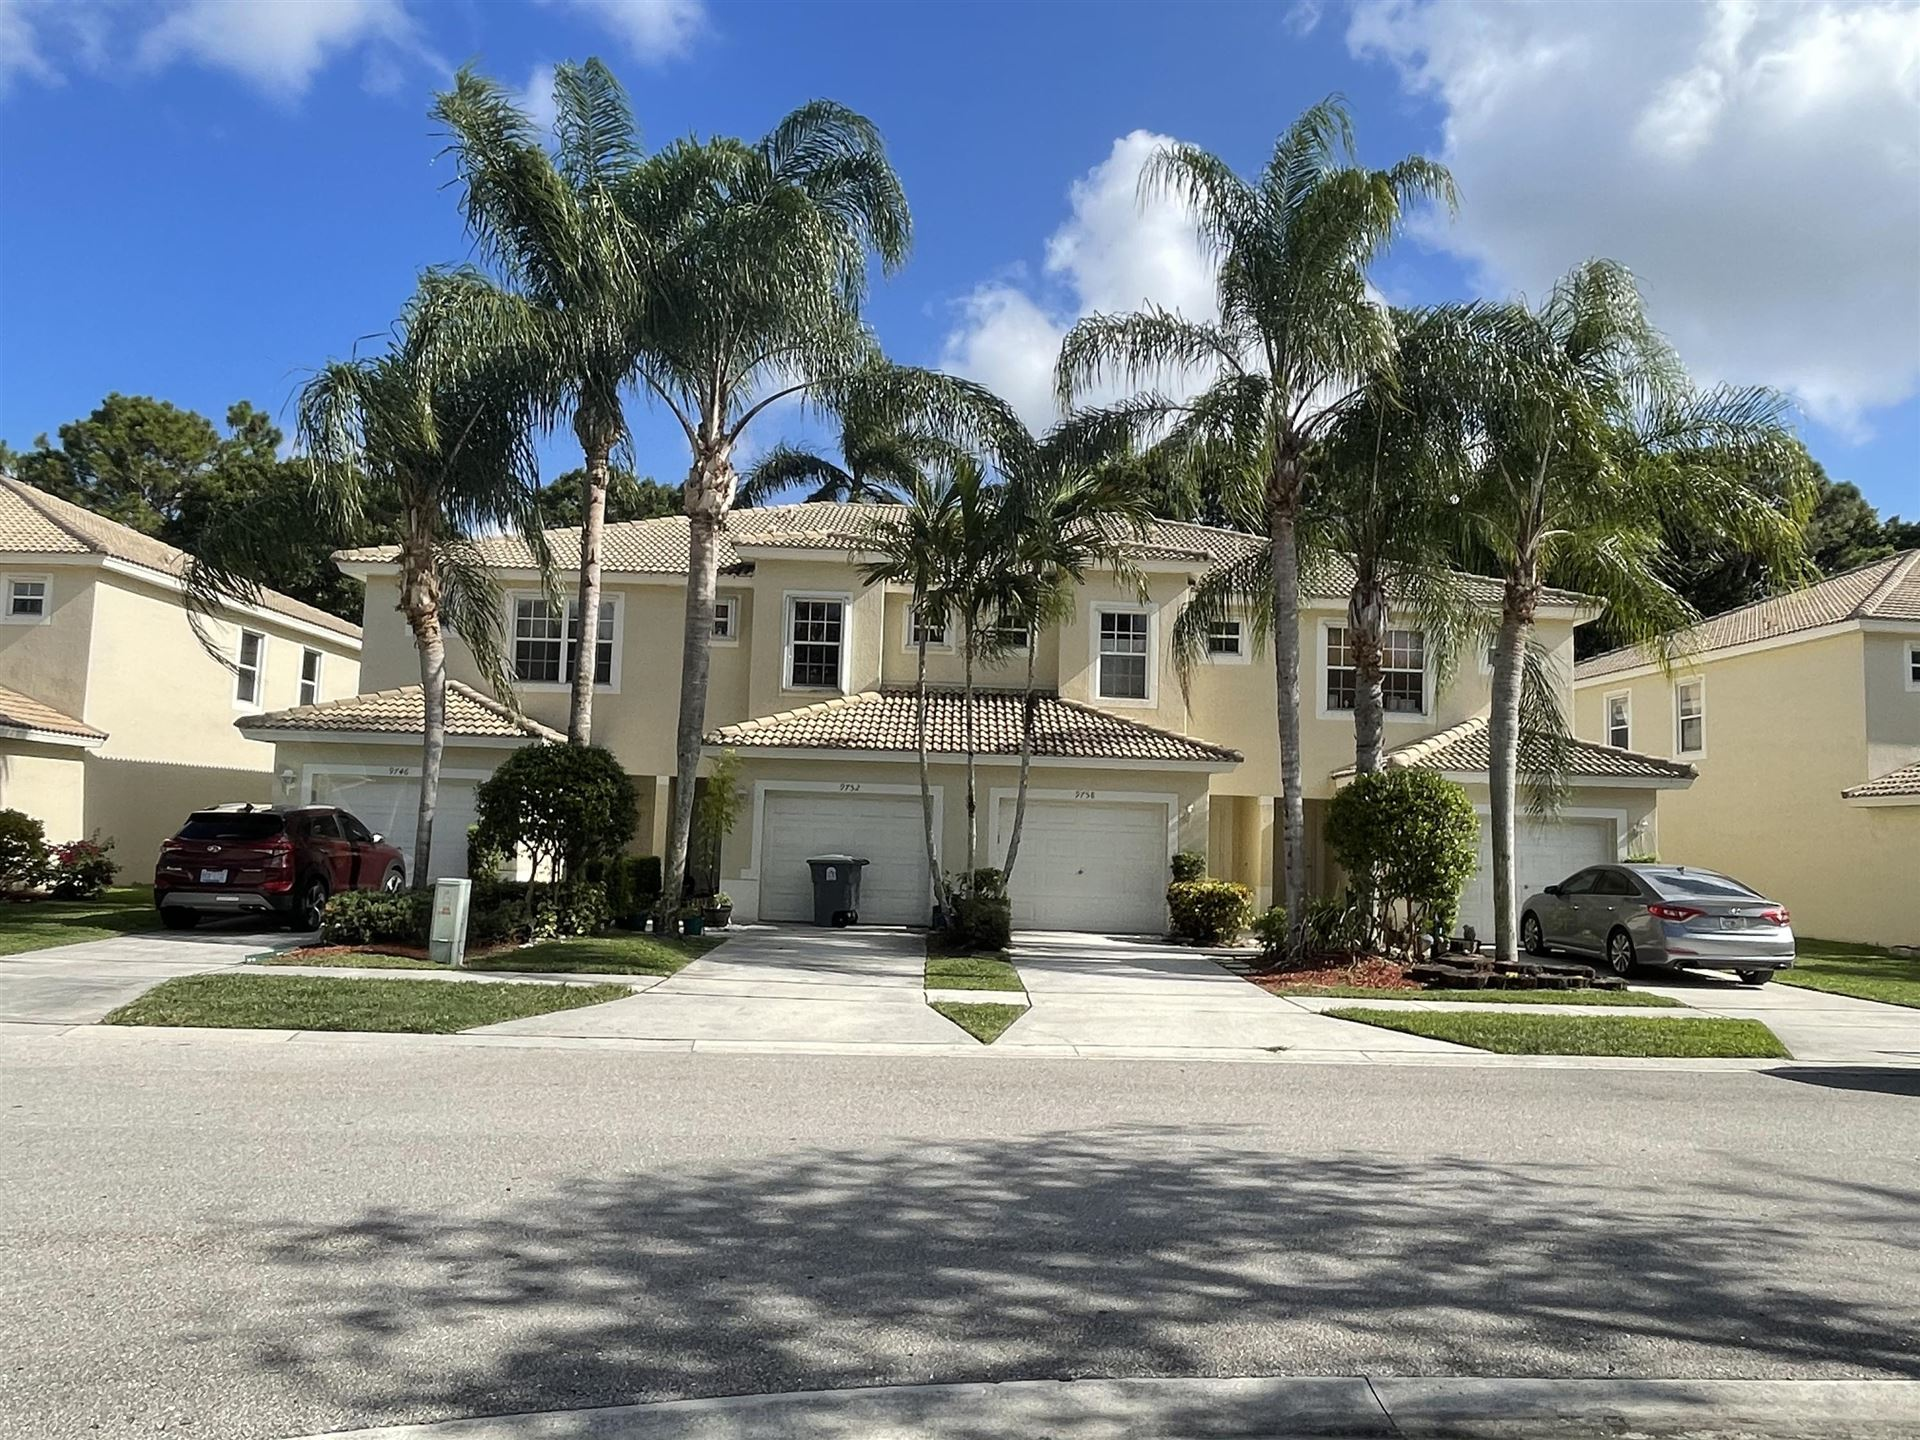 9758 Lago Drive, Boynton Beach, FL 33472 - #: RX-10722834